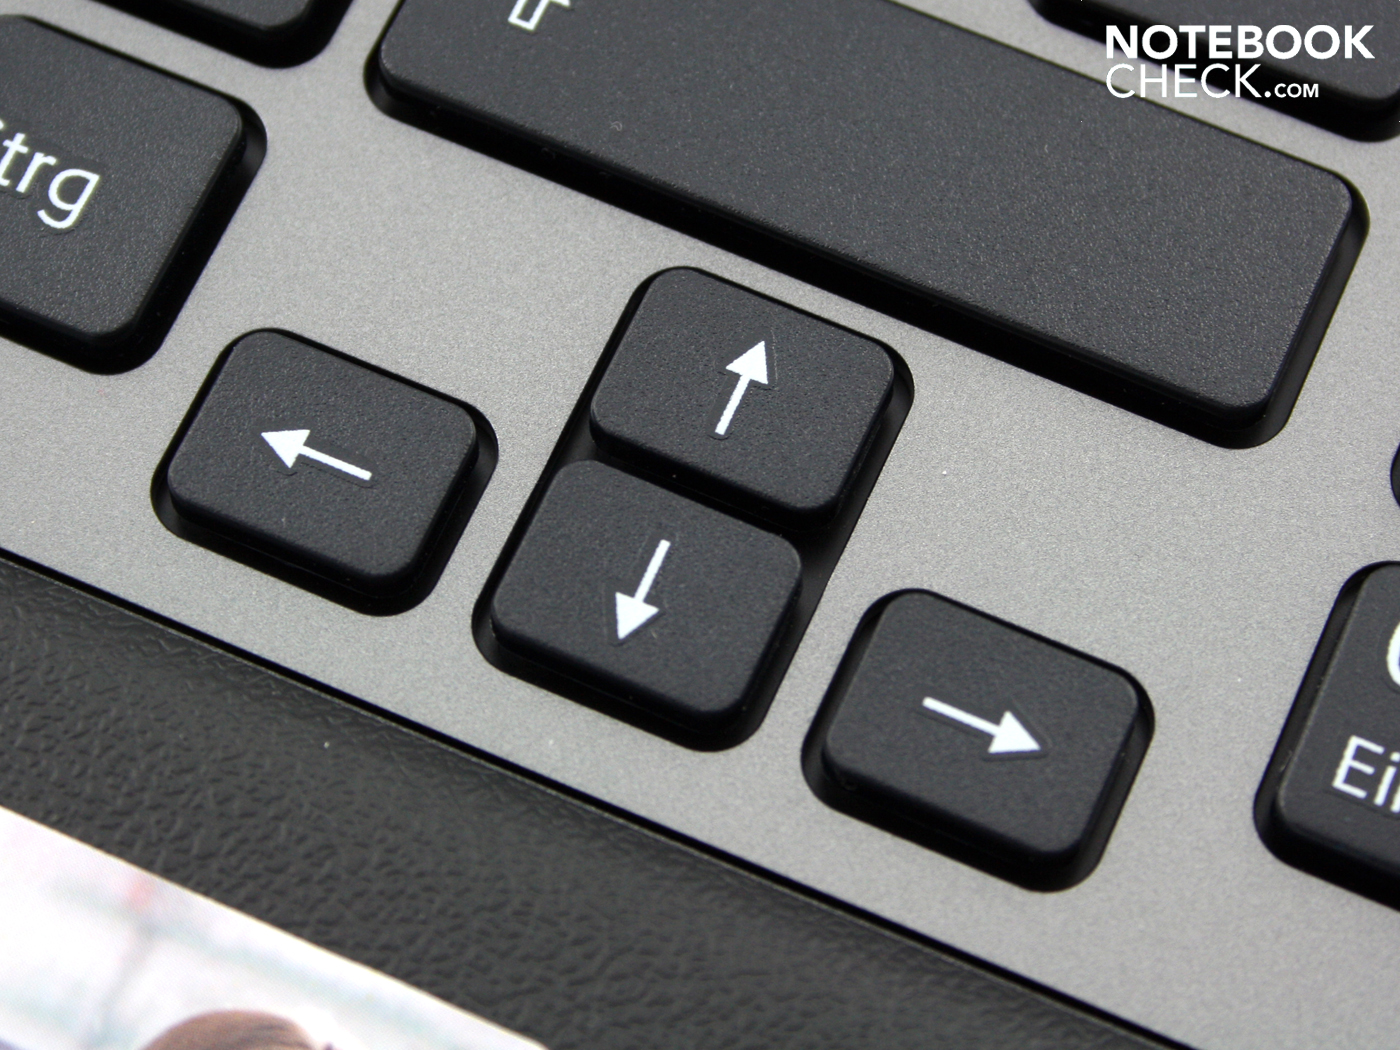 LogiLink USB williamhill rücktrittskosten williamhill kundenservice email Numeric Keypad 18 Keys - Hemelektronik - CDON.COM einzahlungsbonuscode williamhill